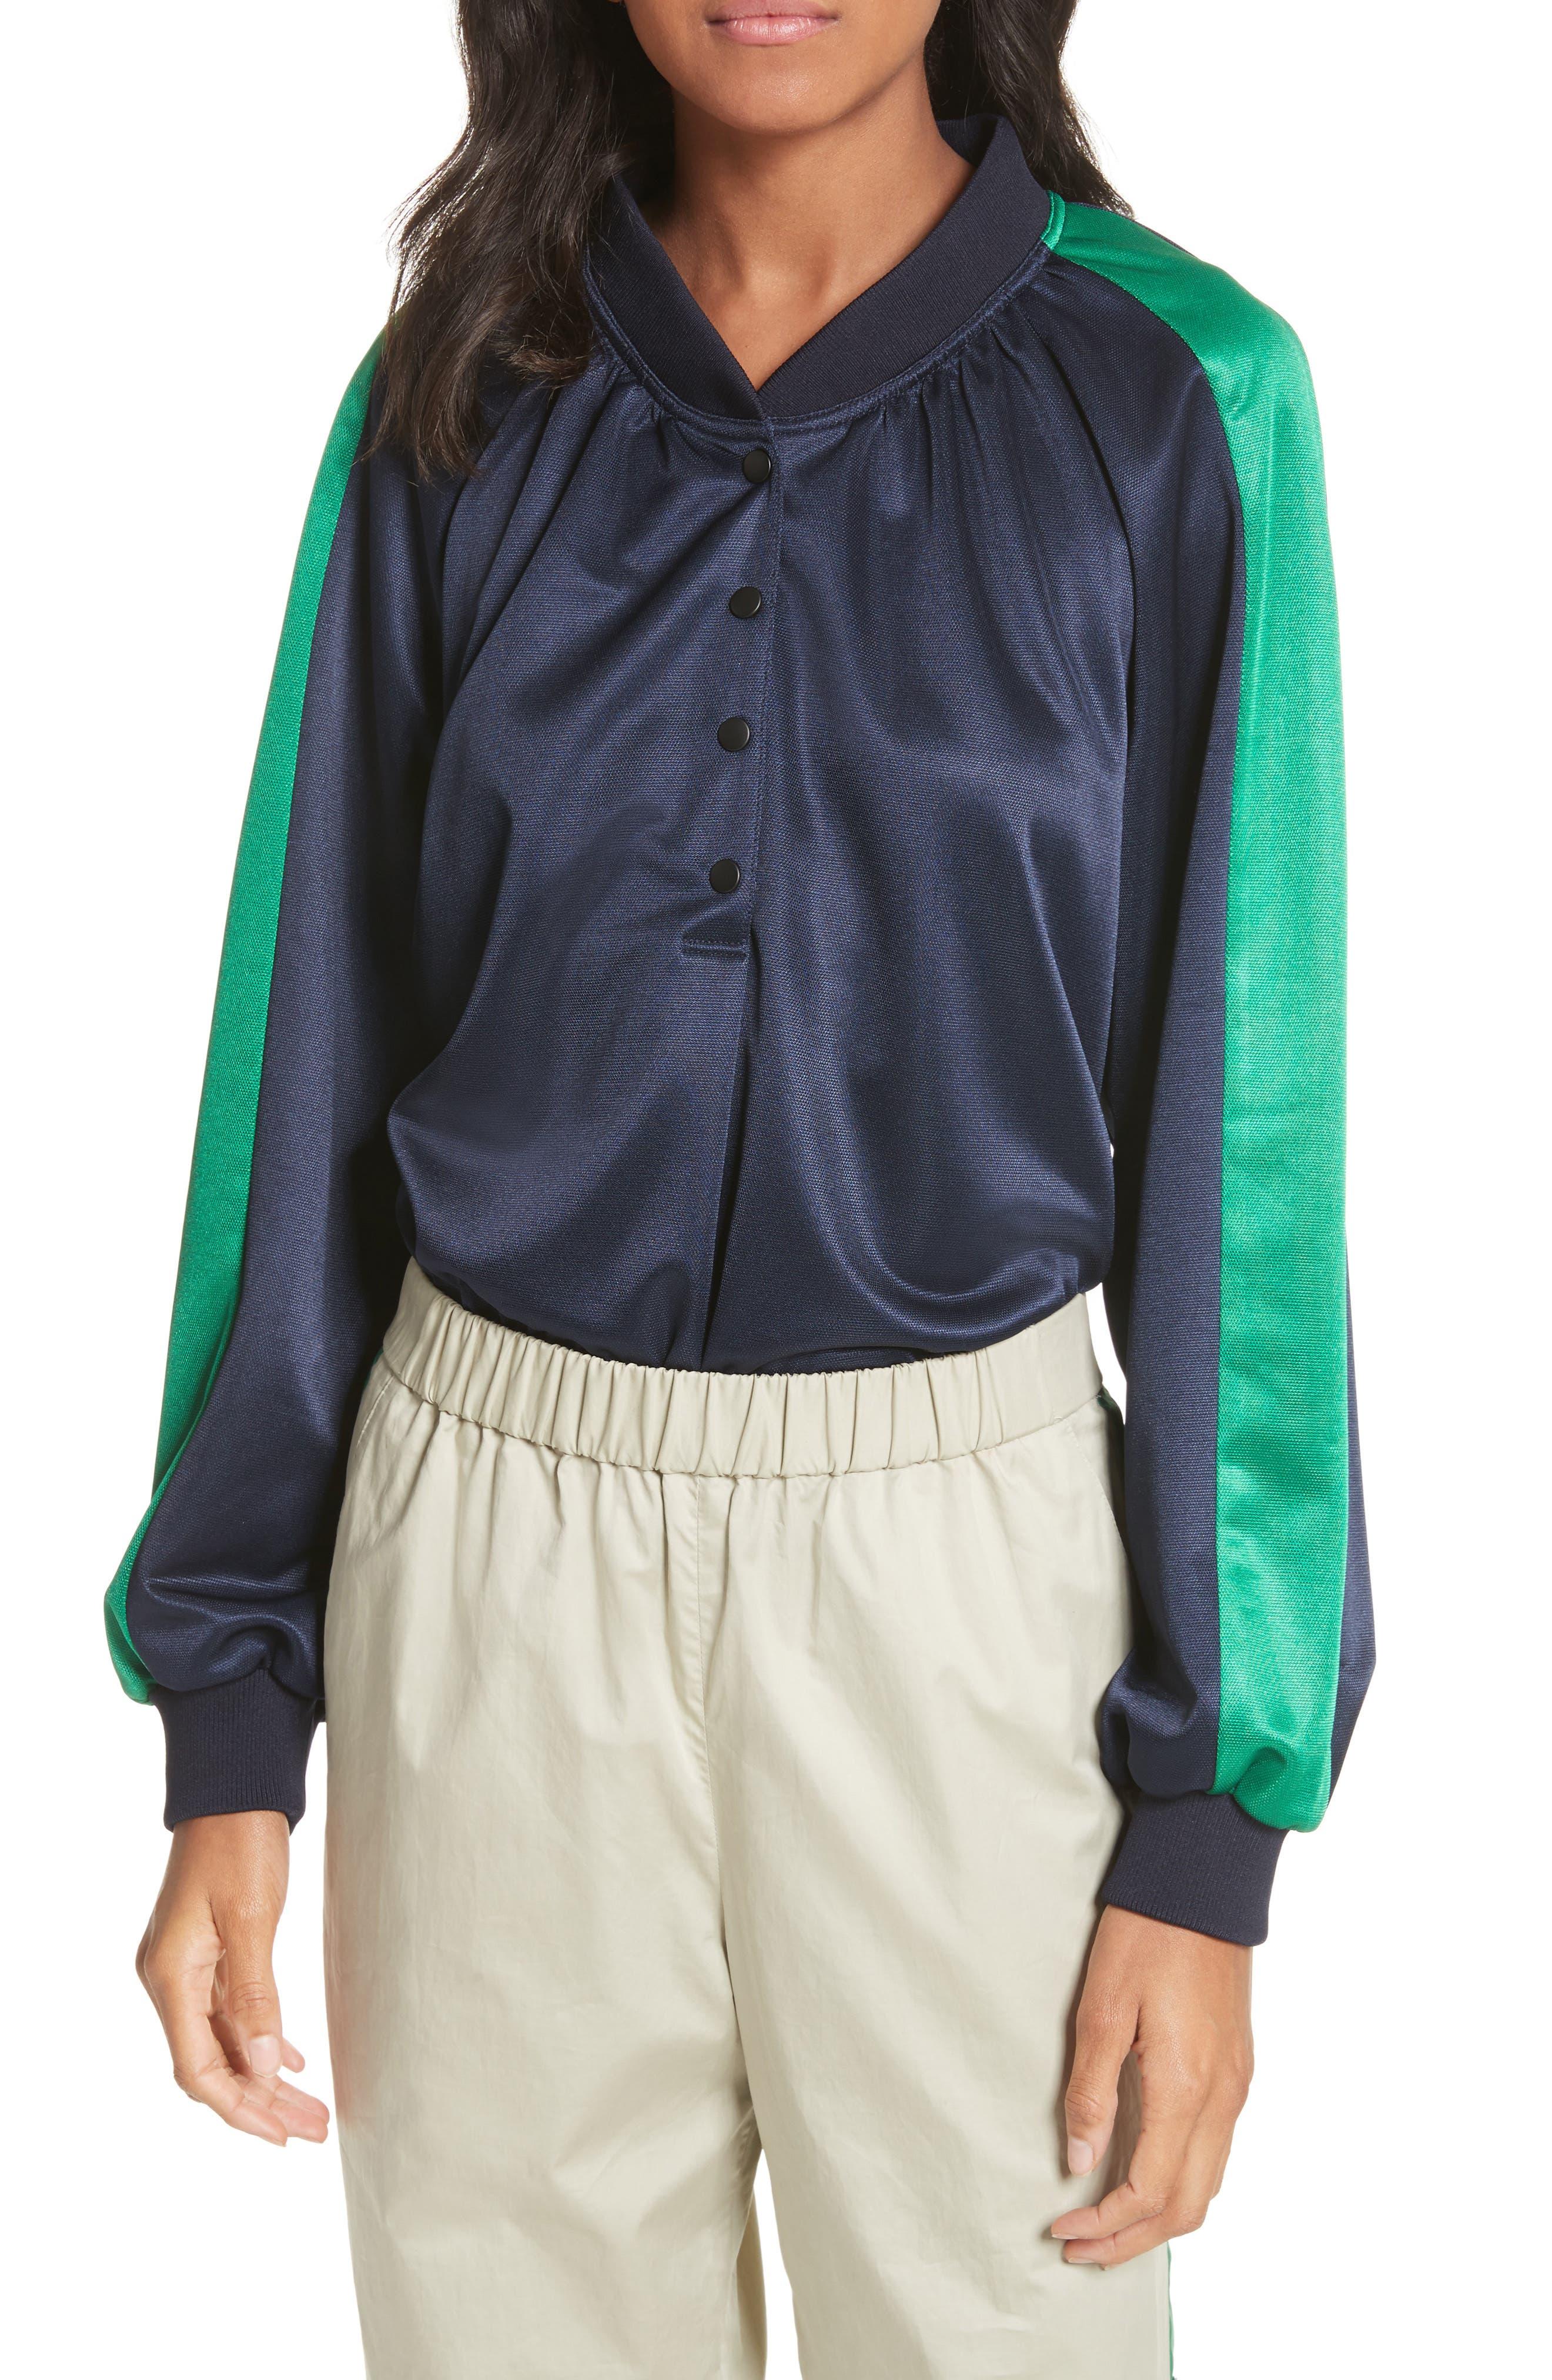 Pullover Track Jacket,                             Main thumbnail 1, color,                             Navy/ Green Multi